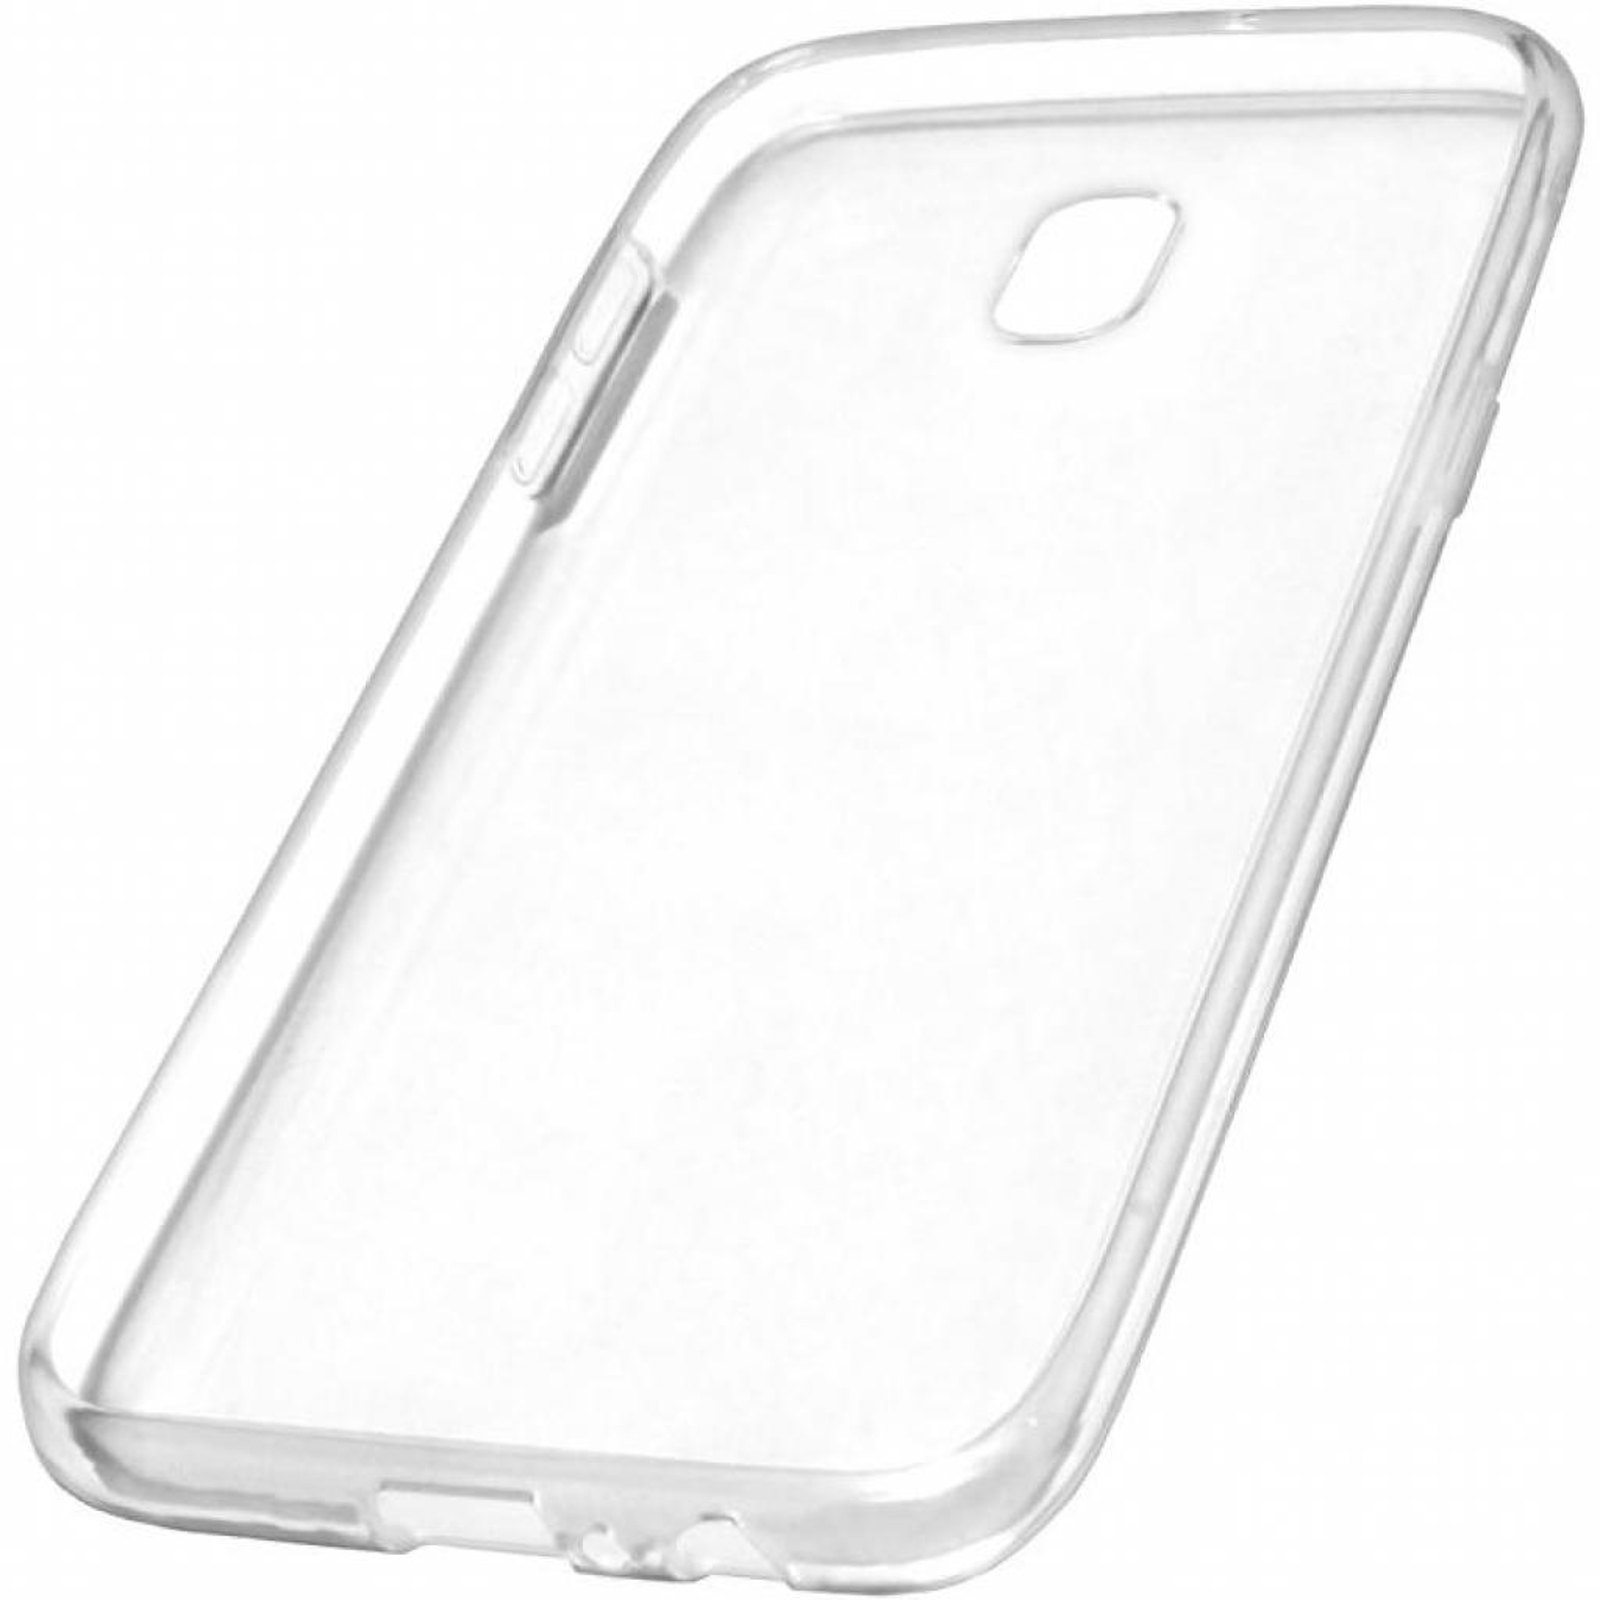 Чехол для моб. телефона SmartCase Samsung Galaxy J3 /J330 TPU Clear (SC-J330) изображение 2